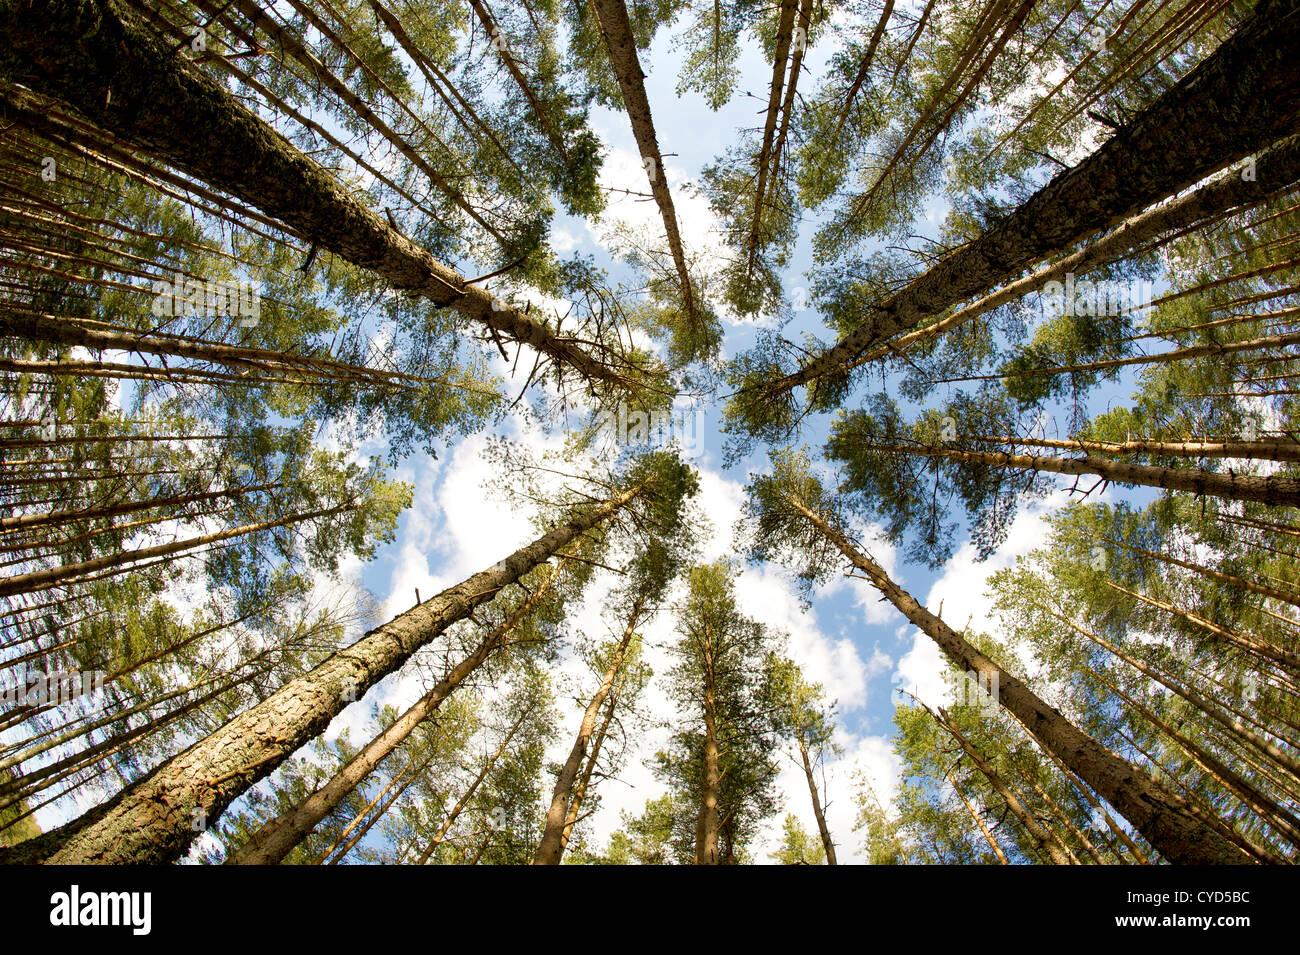 Scottish caledonian pinos fotografiado a través de un lente de ojo de pez Foto de stock